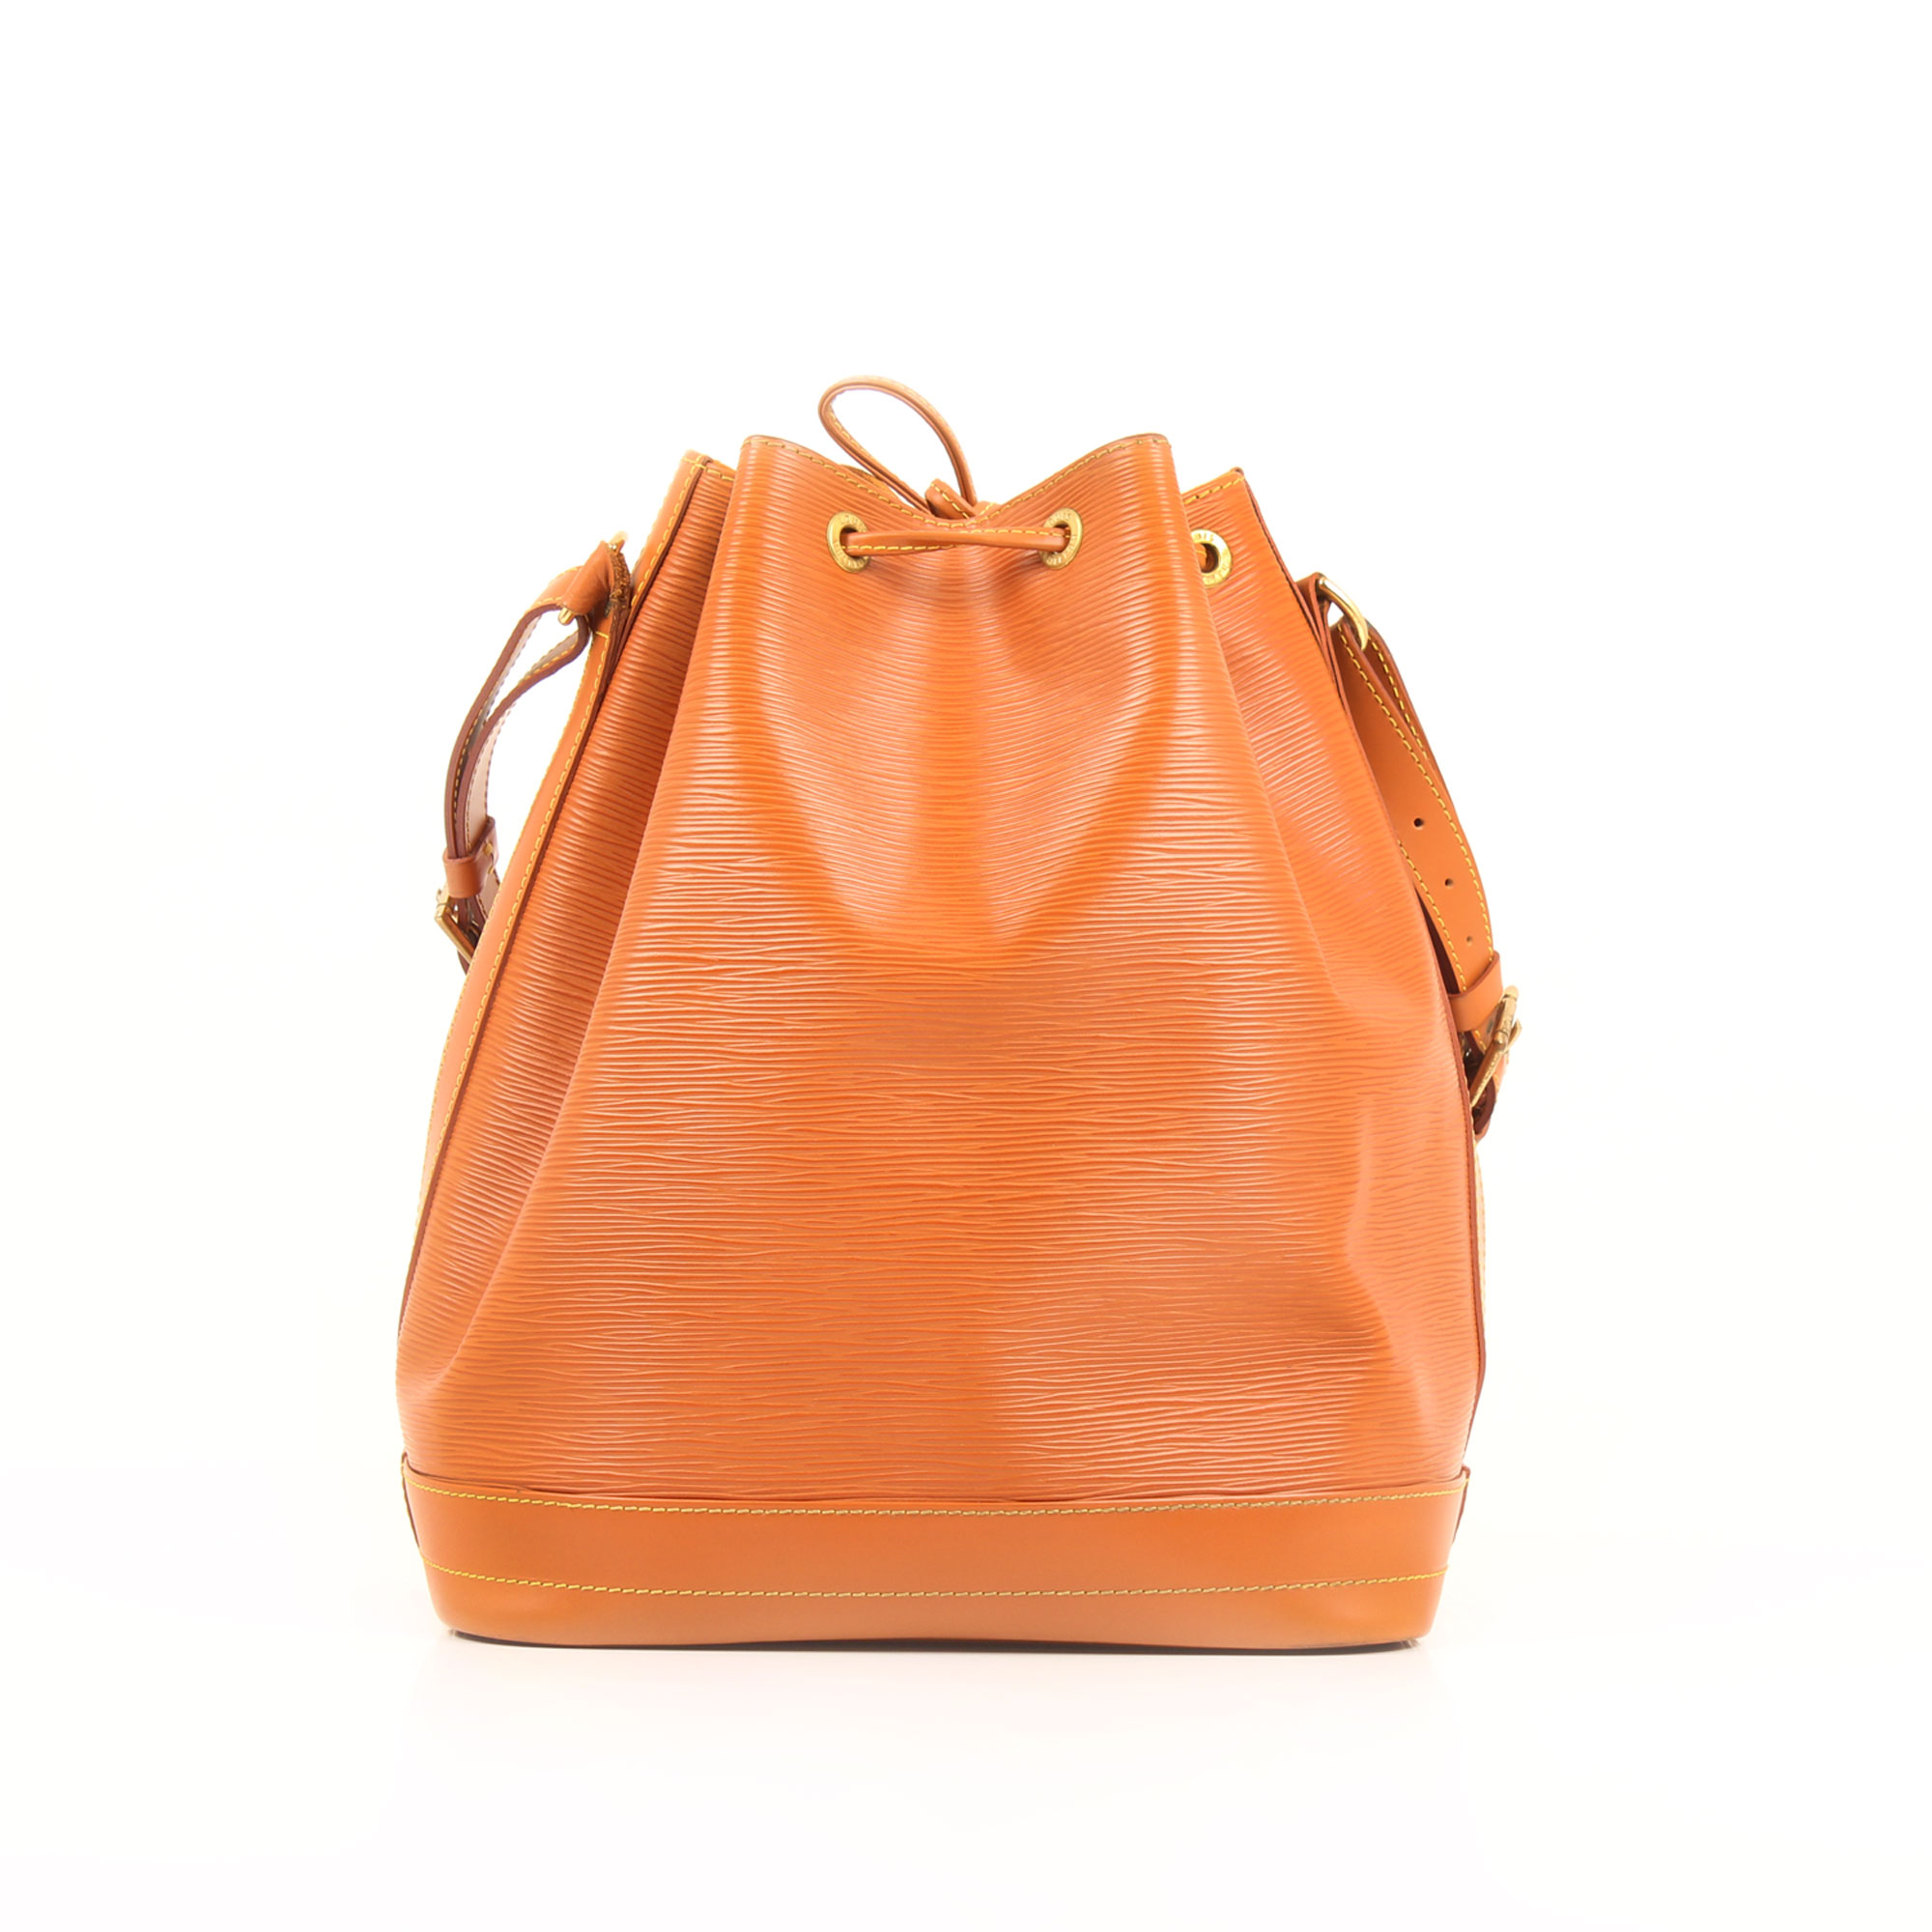 Imagen trasera del bolso louis vuitton noe piel epi marron